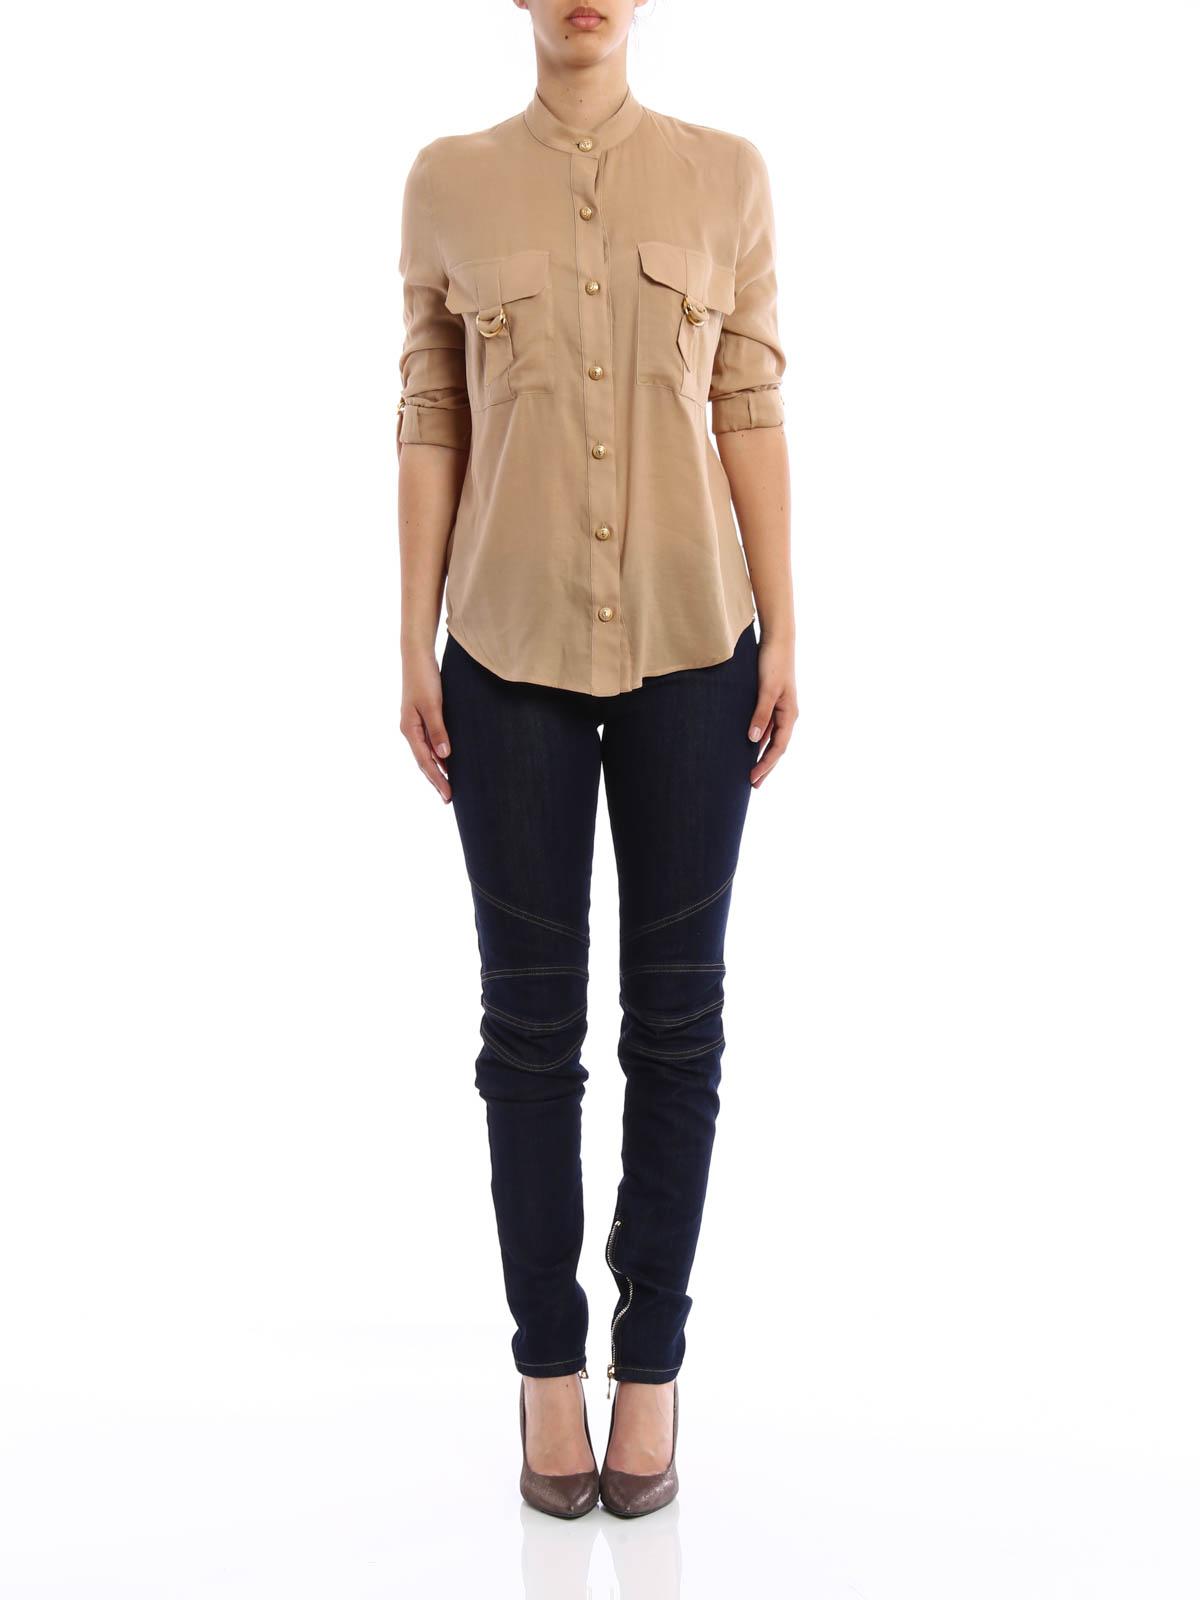 Safari Shirt Cognac Heels: Cotton Blend Safari Shirt By Balmain - Shirts